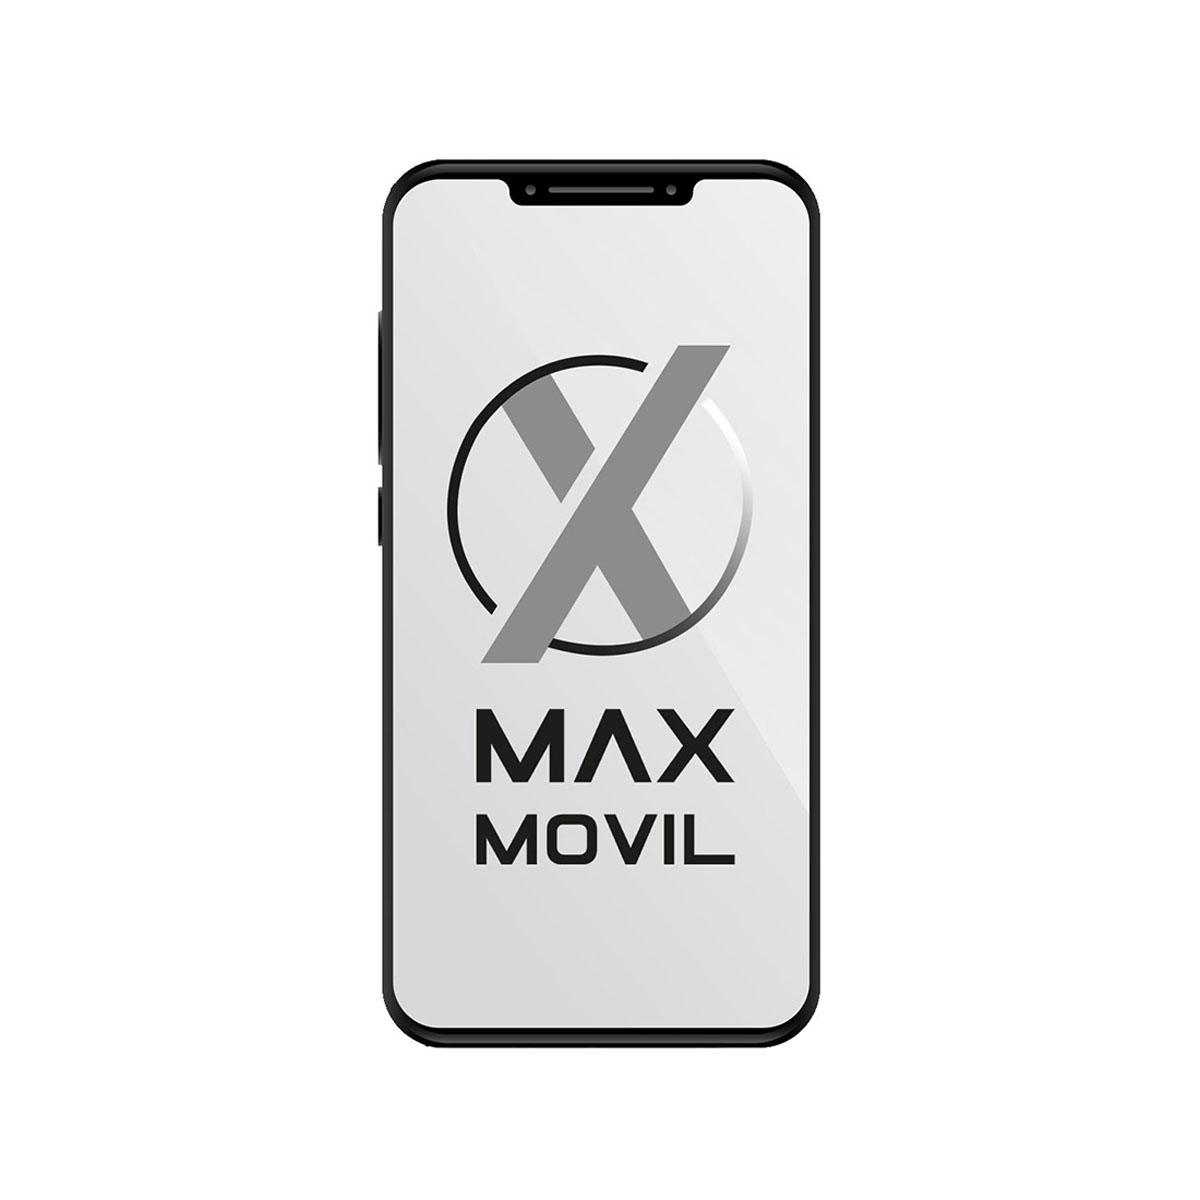 Apple iPhone 11 Reacondicionado 64GB Amarillo